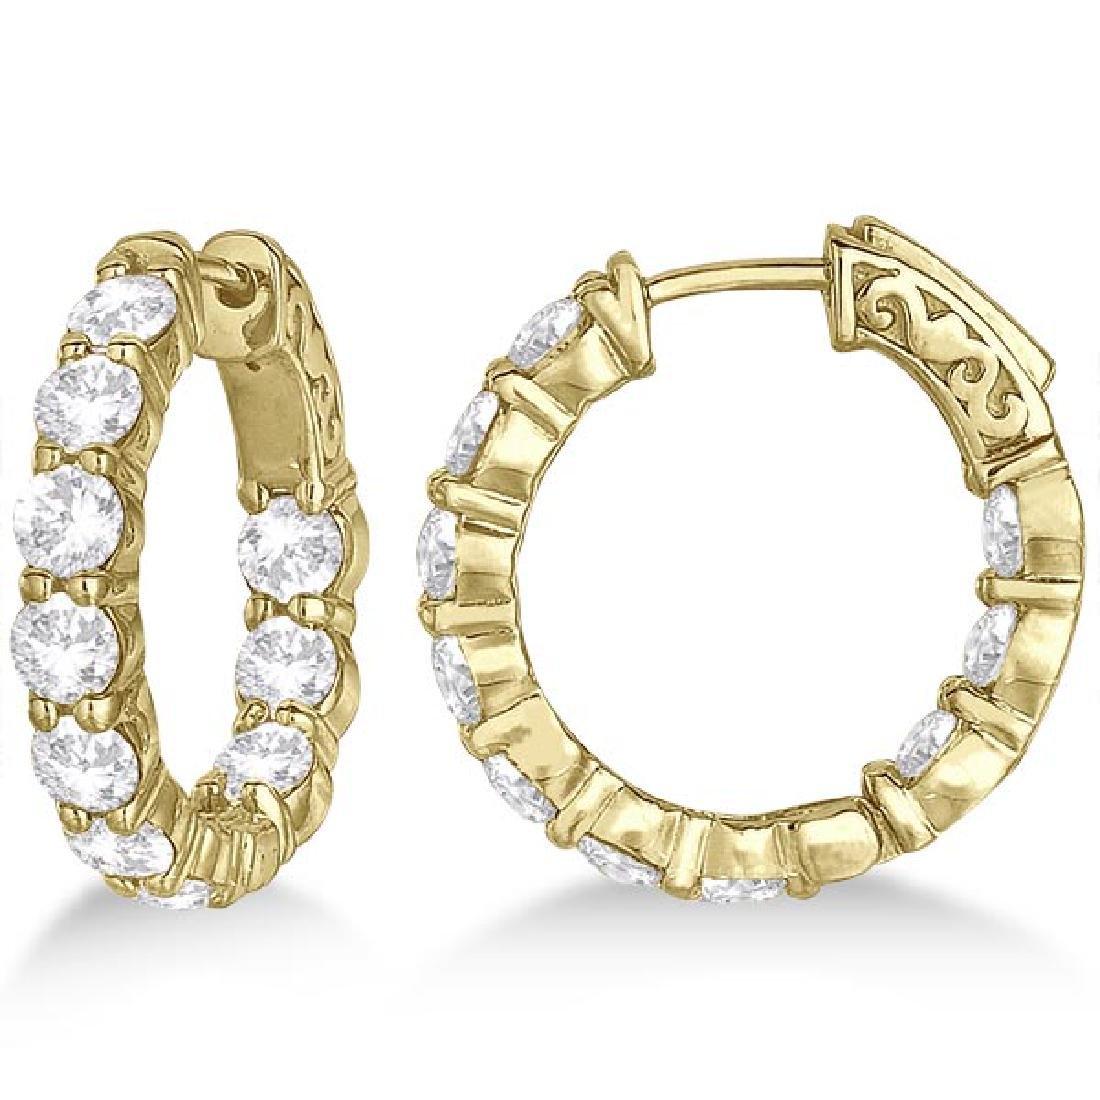 Small Round Diamond Hoop Earrings 14k Yellow Gold (4.00